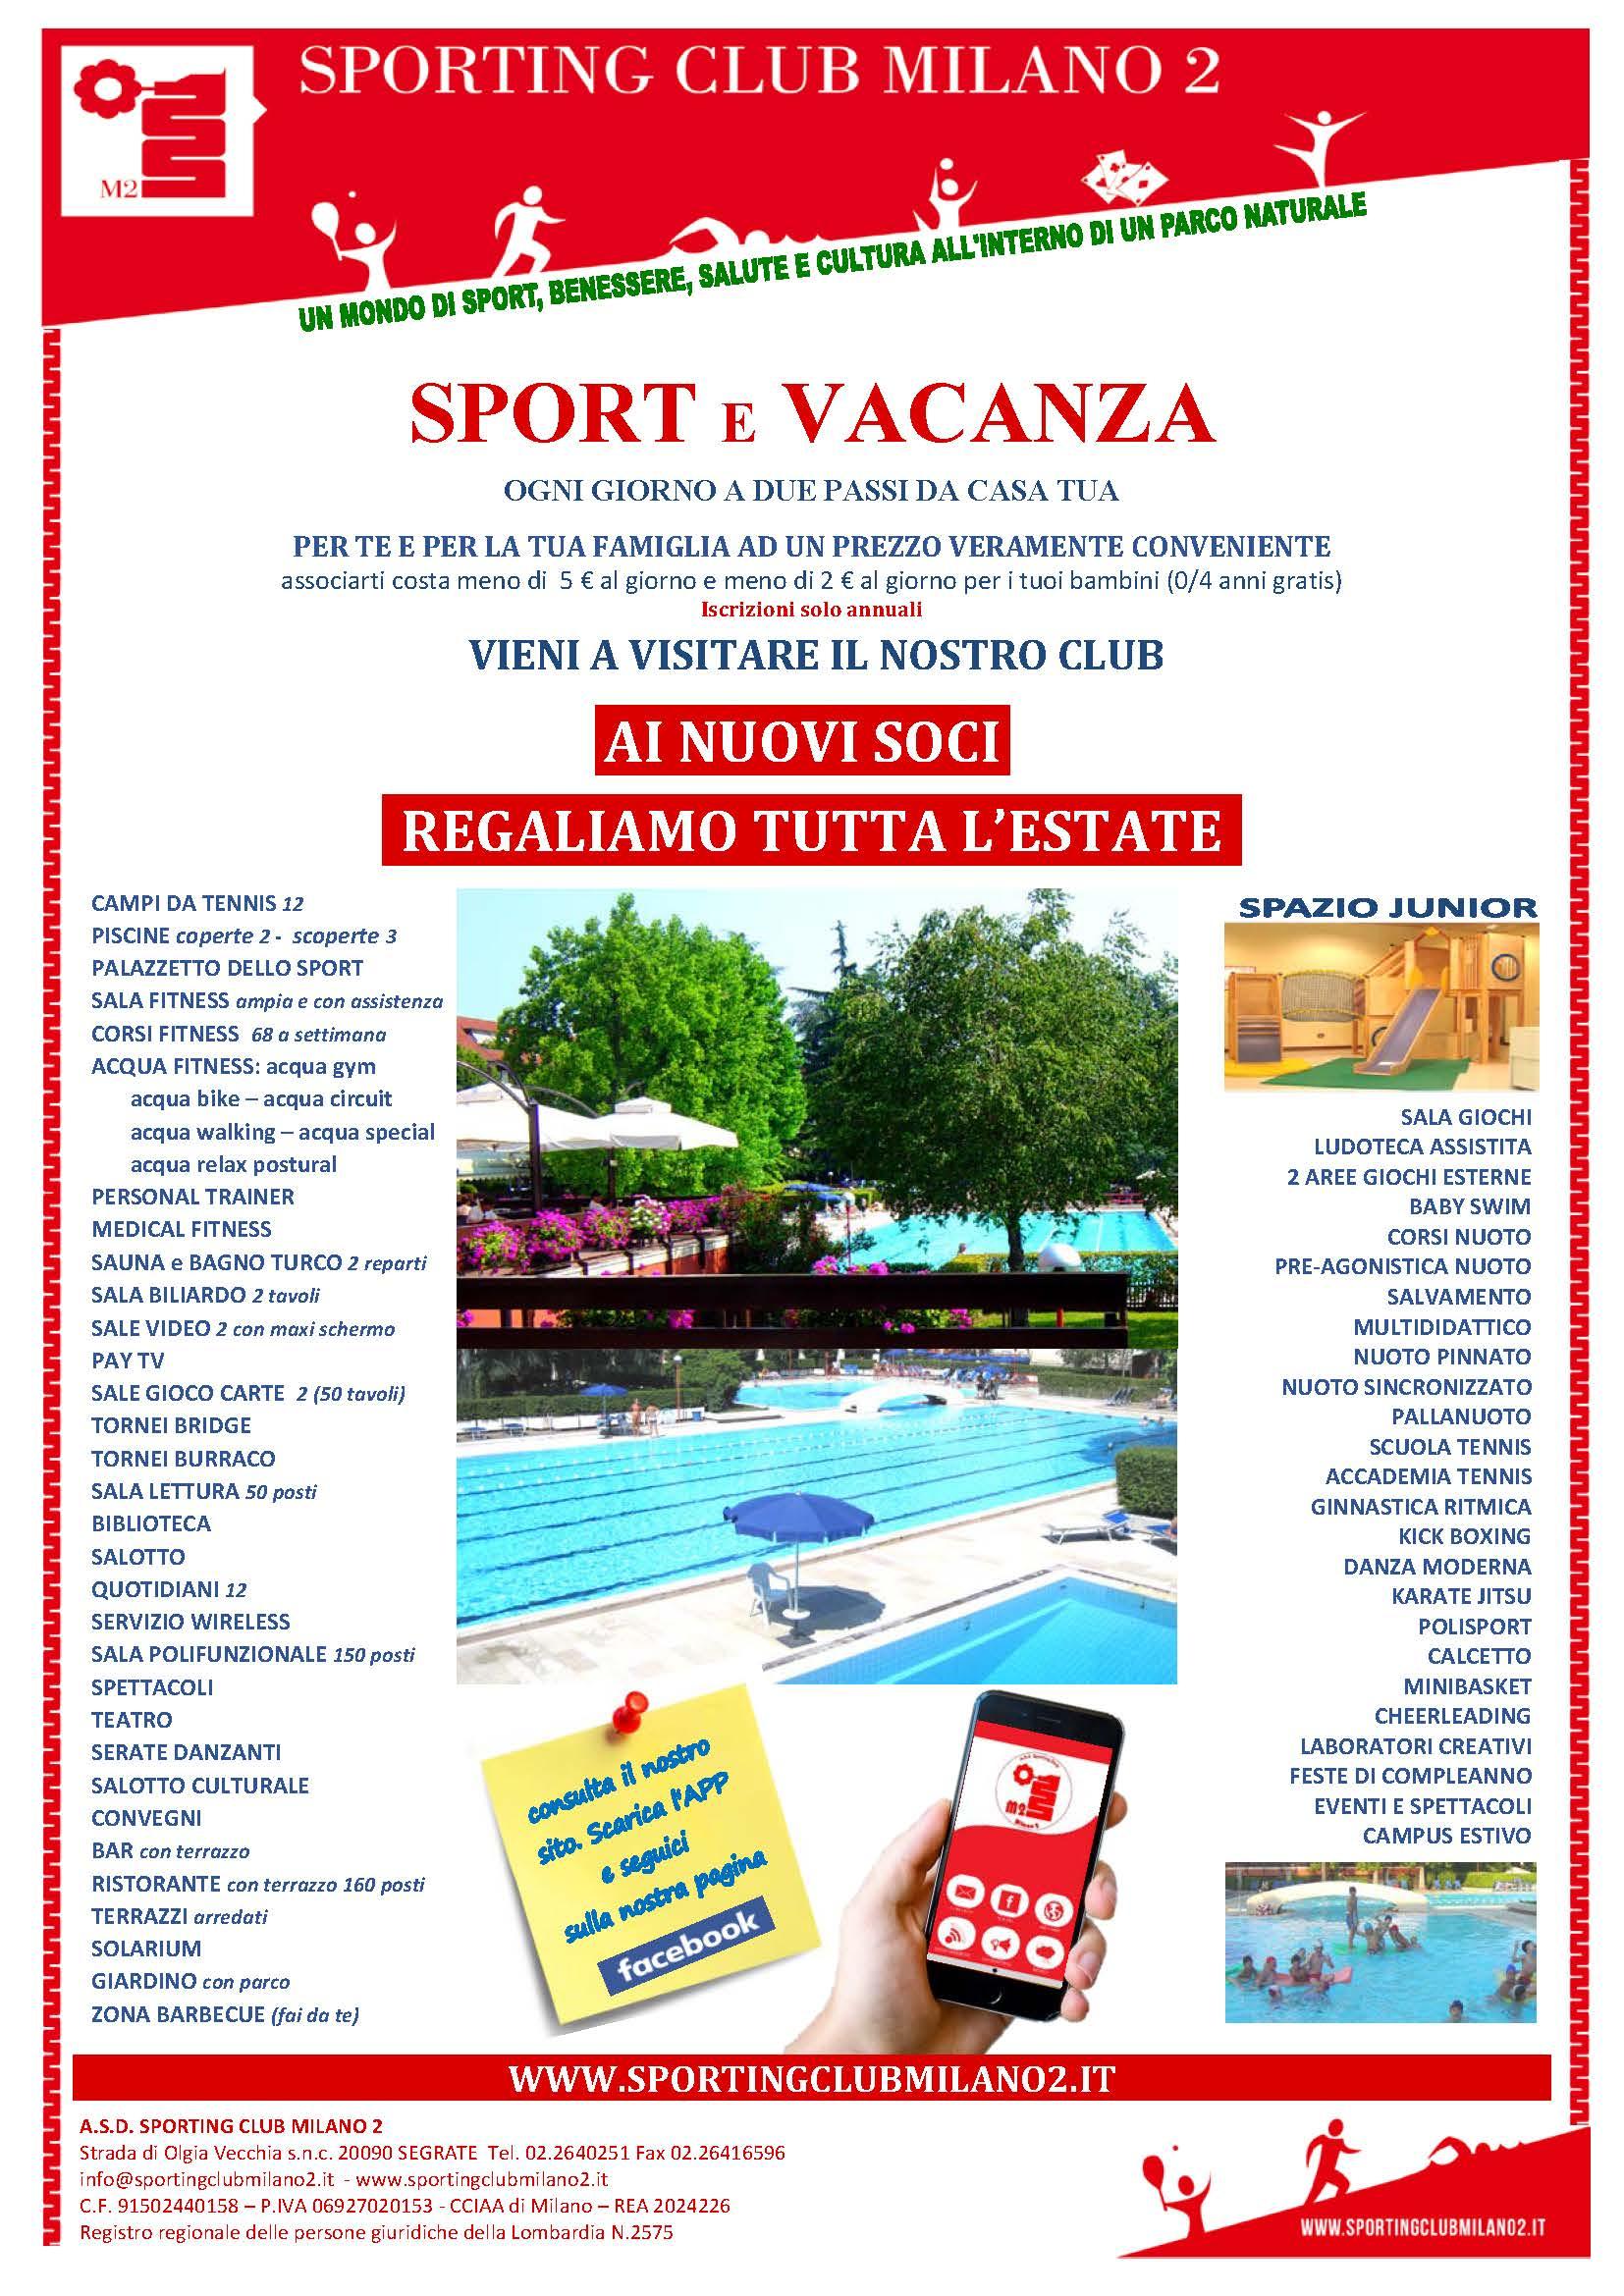 248fed9ac7f1 Sporting Club Milano 2 - Home